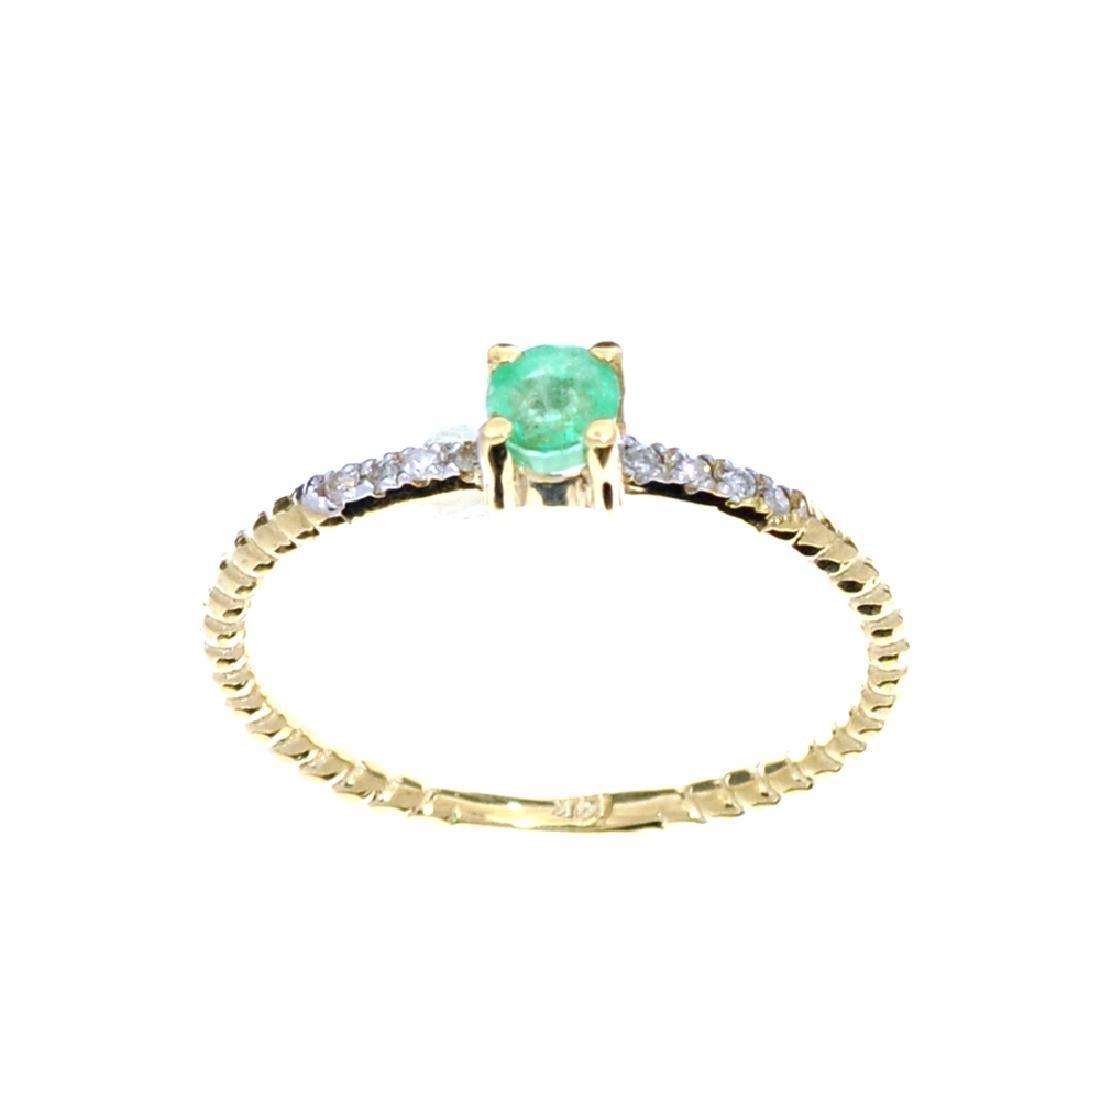 APP: 0.6k Fine Jewelry 14KT Gold, 0.21CT Round Cut